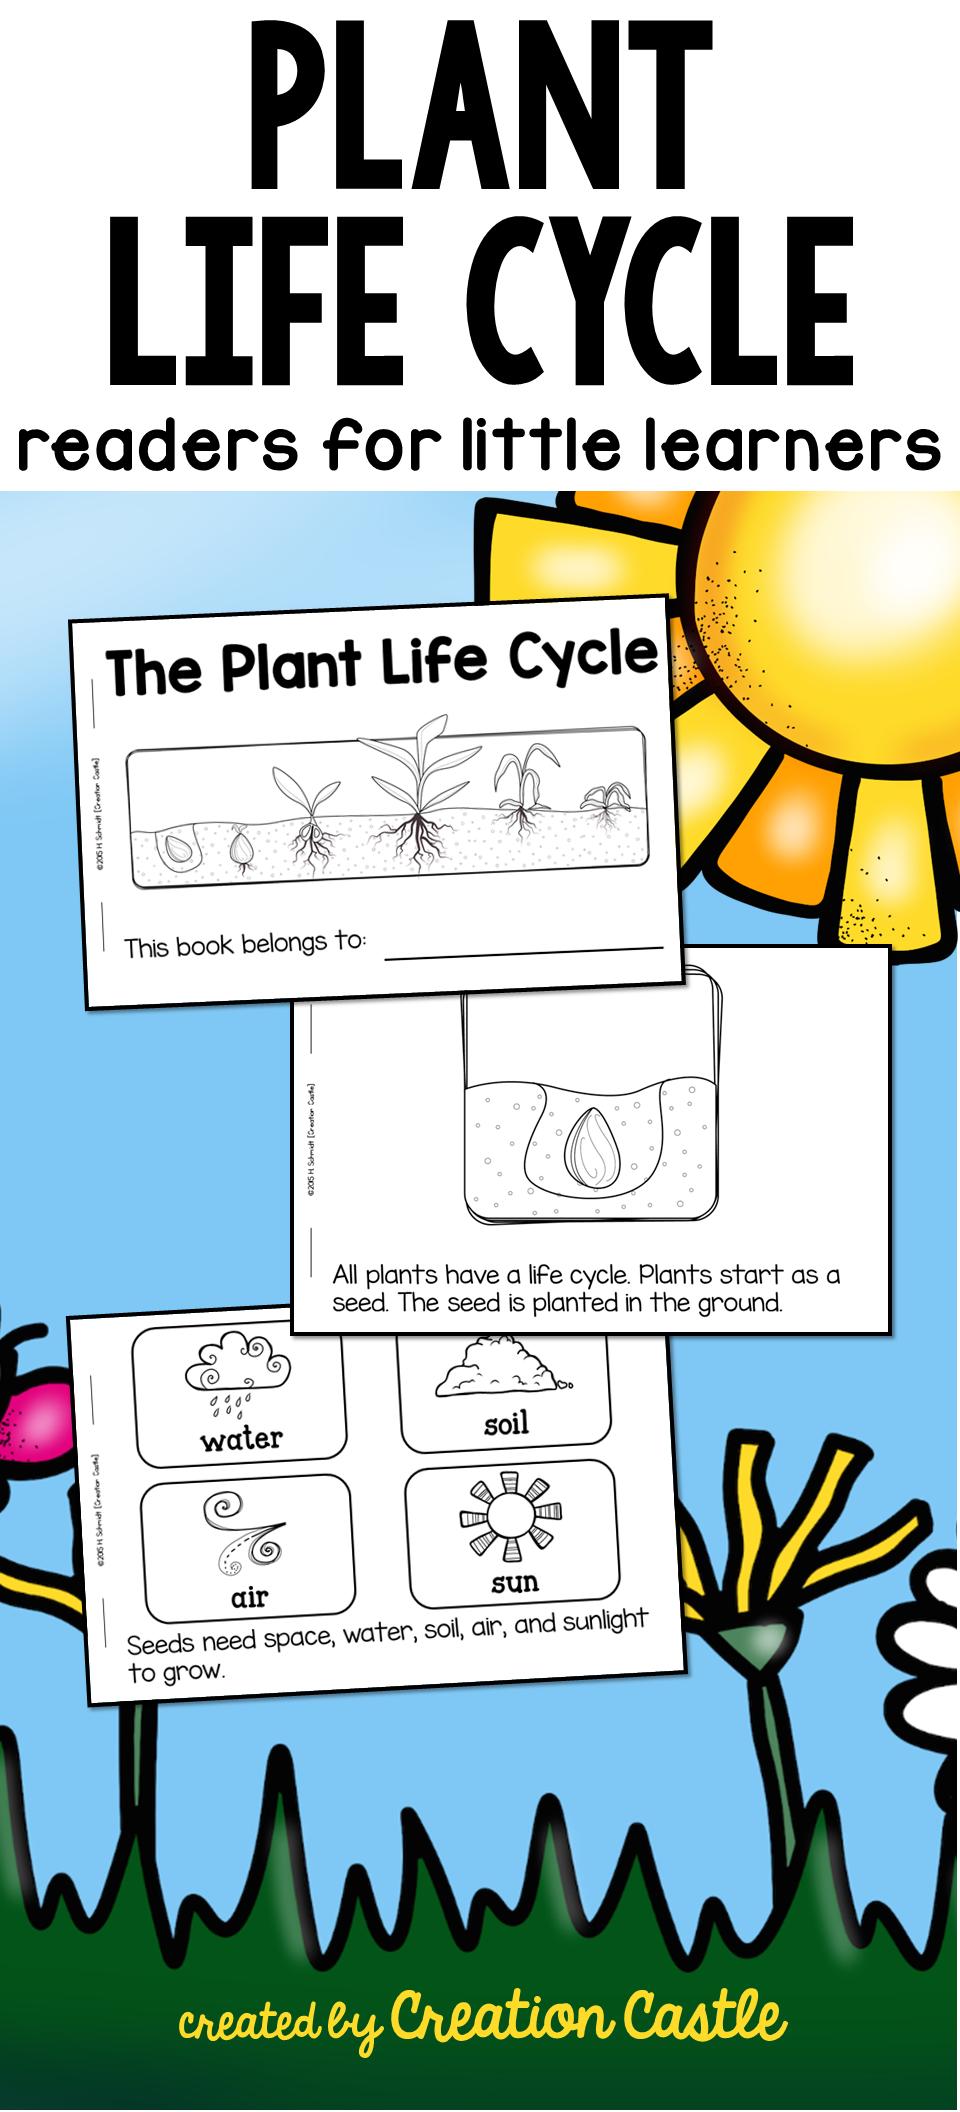 Plant Life Cycle Plant Life Cycle Life Cycle Books Life Cycles [ 2112 x 960 Pixel ]